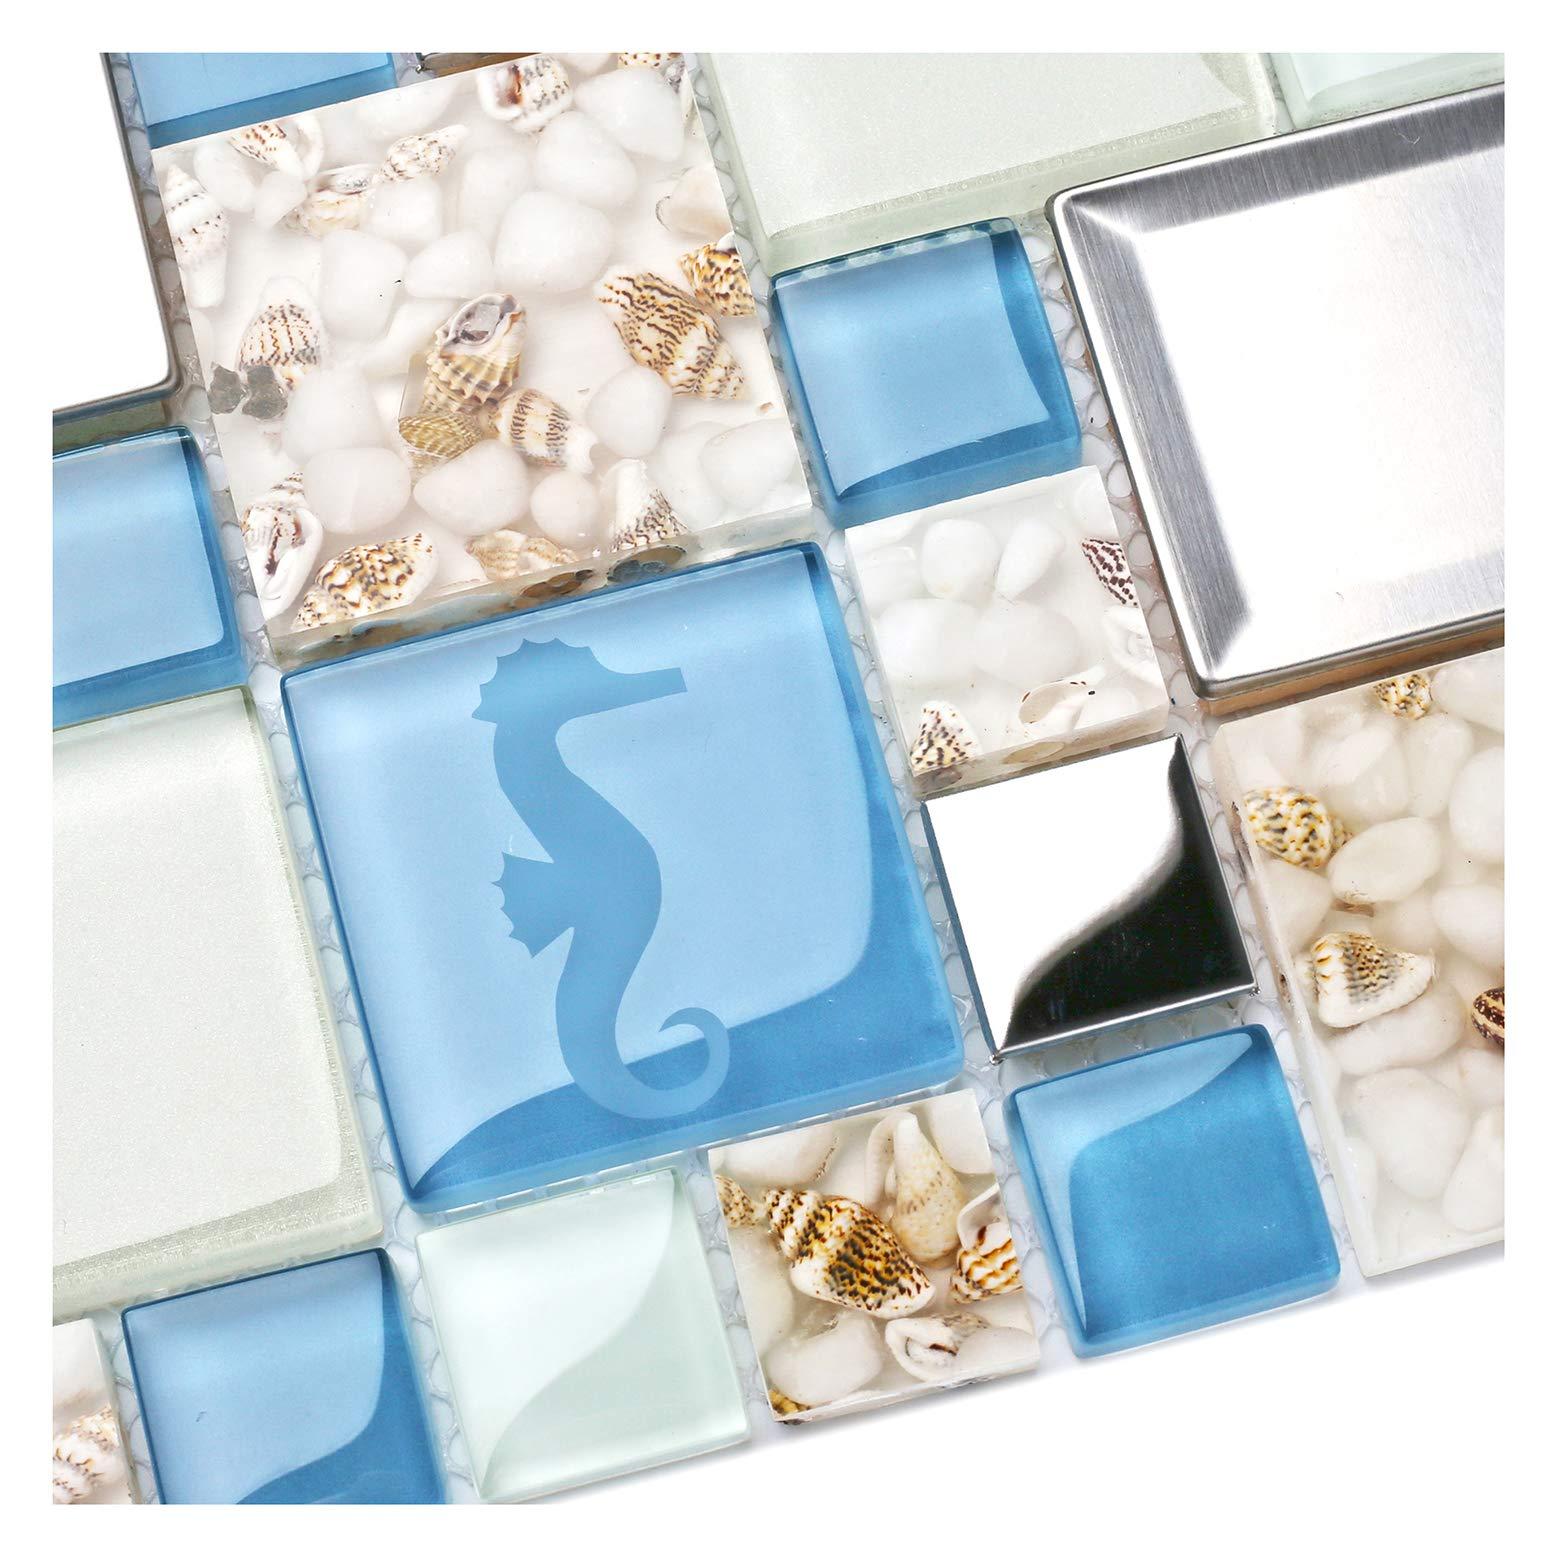 New Idea Tile Kitchen Bath Backsplash Accent Wall Decor TST Glass Metal Tile Marine Animals Icon Beach Style Inner Conch Sea Blue Mosaic Tiles TSTNB11 (1 Sample 12x12 Inches)